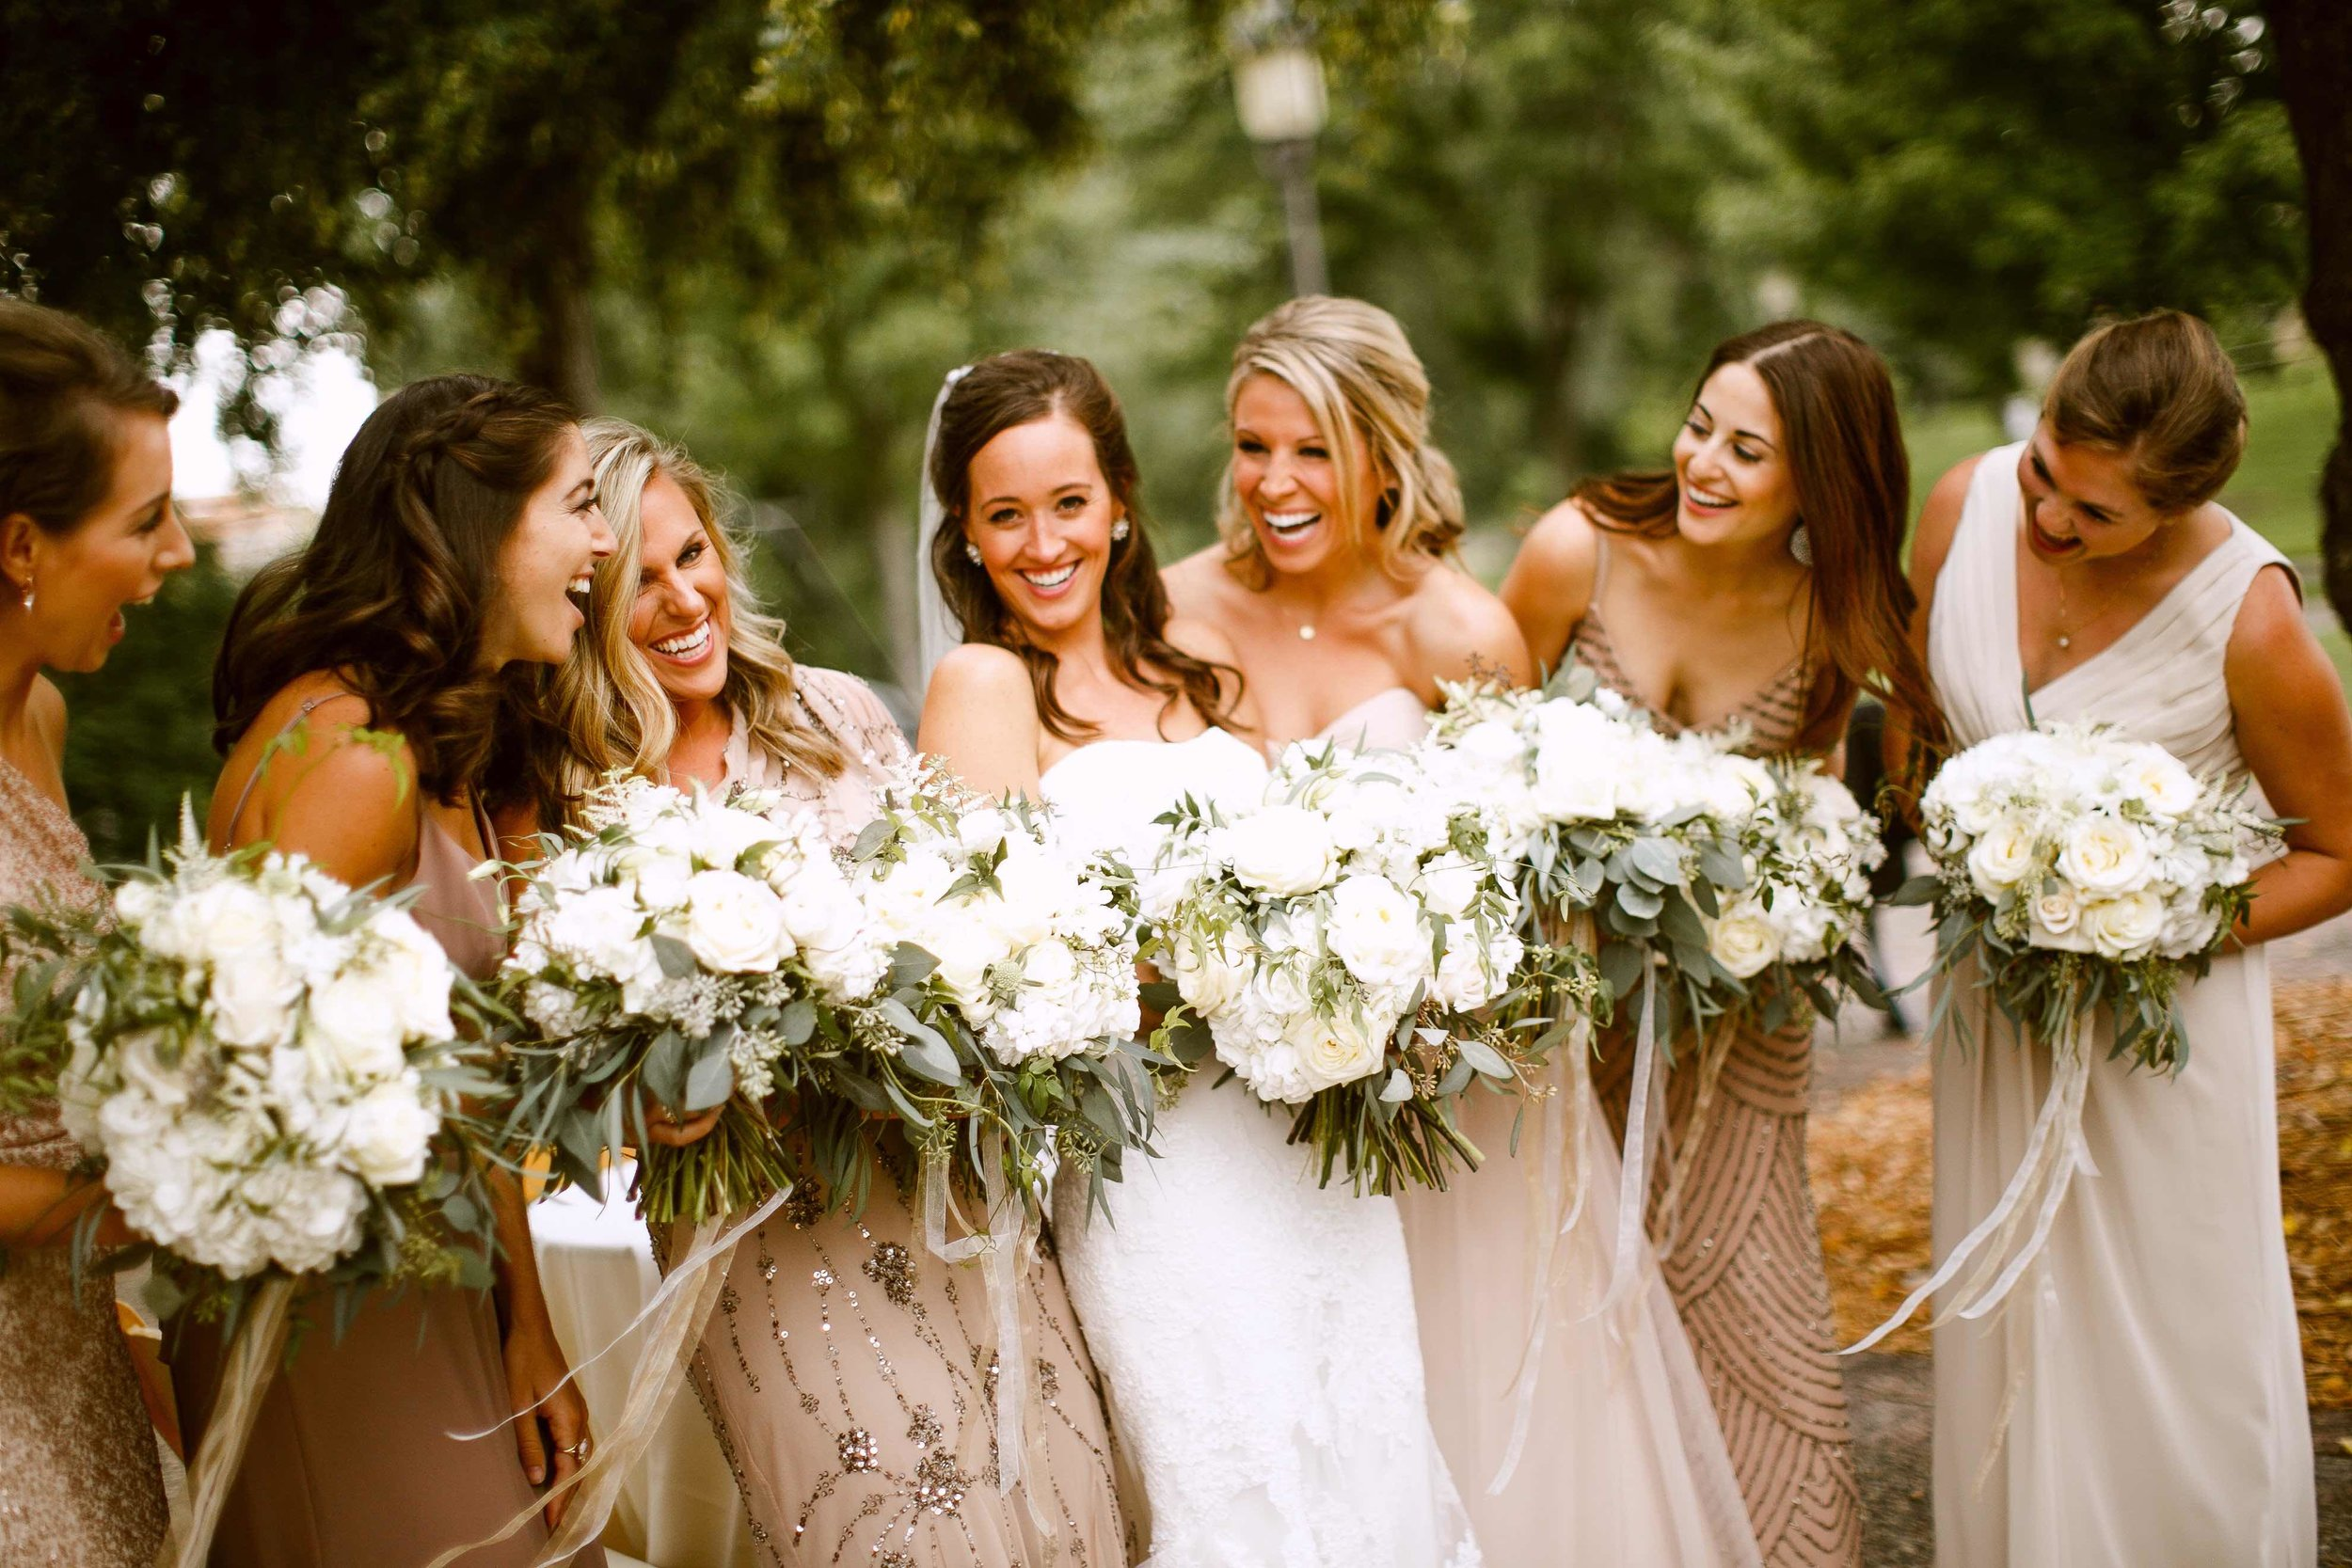 Bridesmaids 500 res.jpg